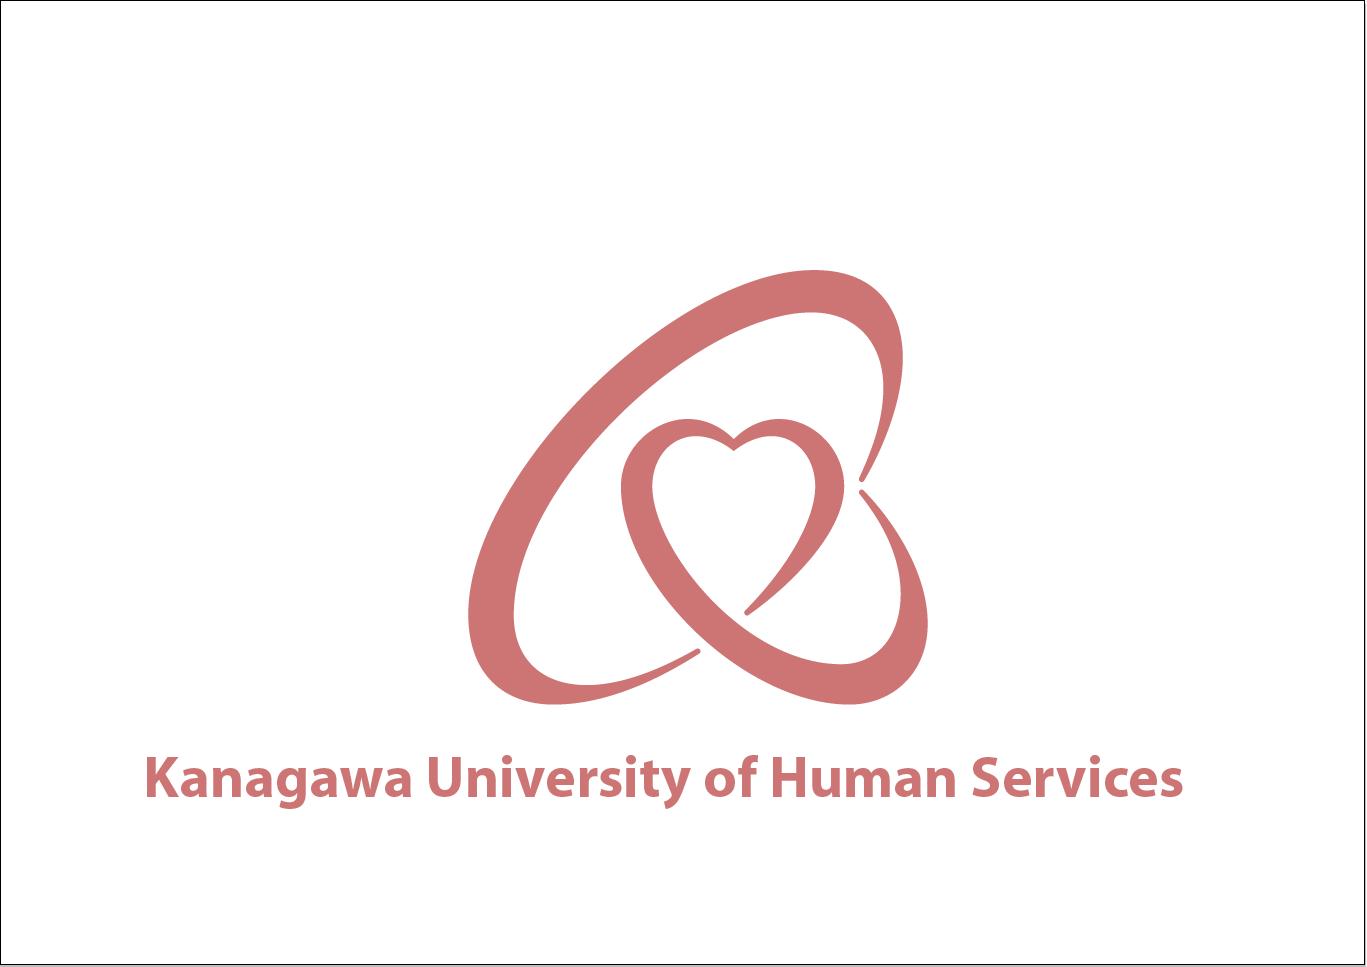 Kanagawa University of Human Services